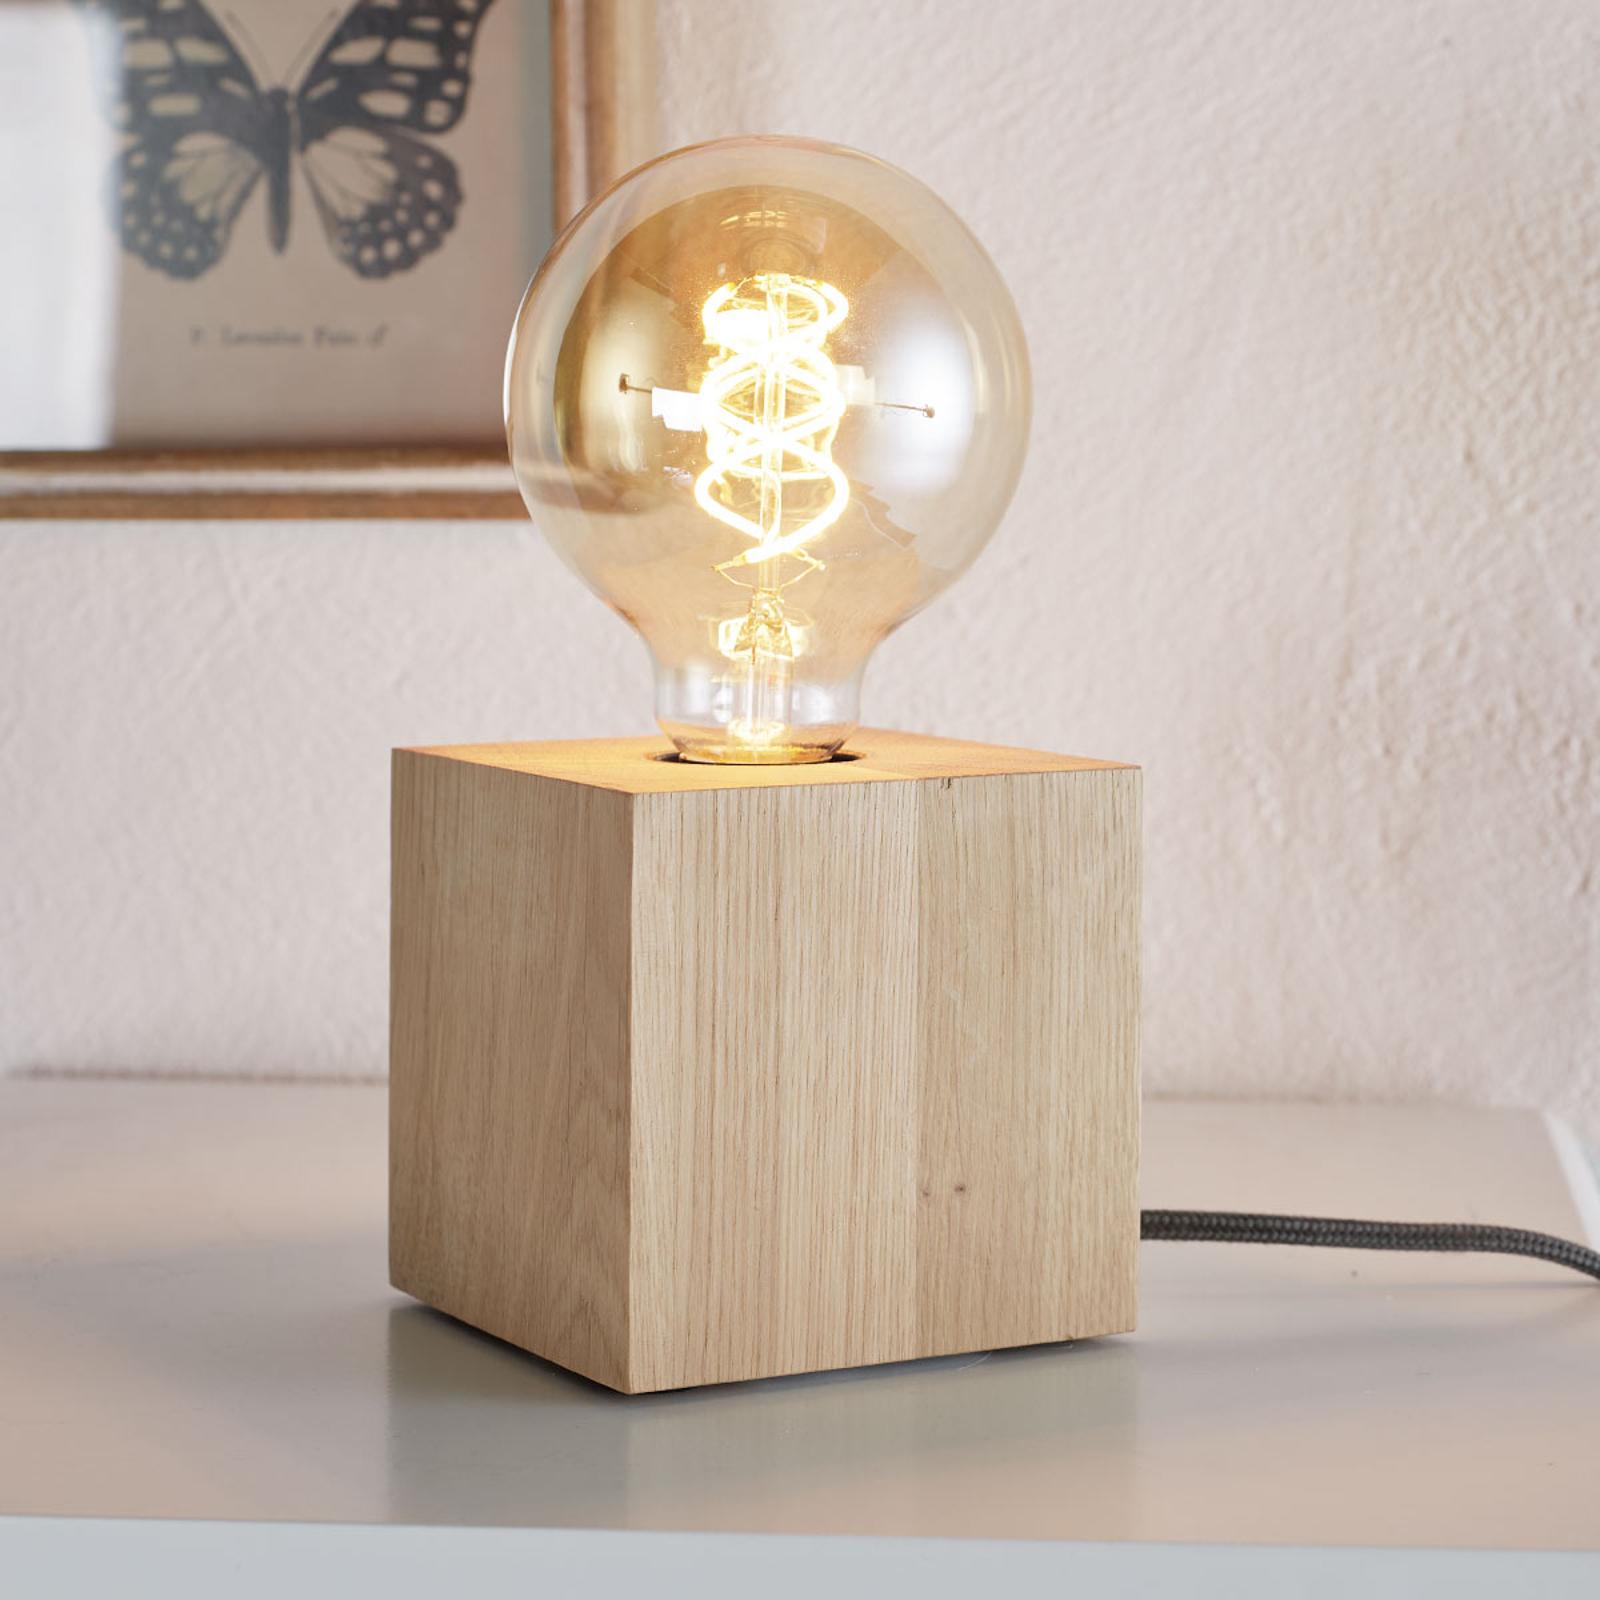 Kubusvormige tafellamp Trongo, antraciet kabel